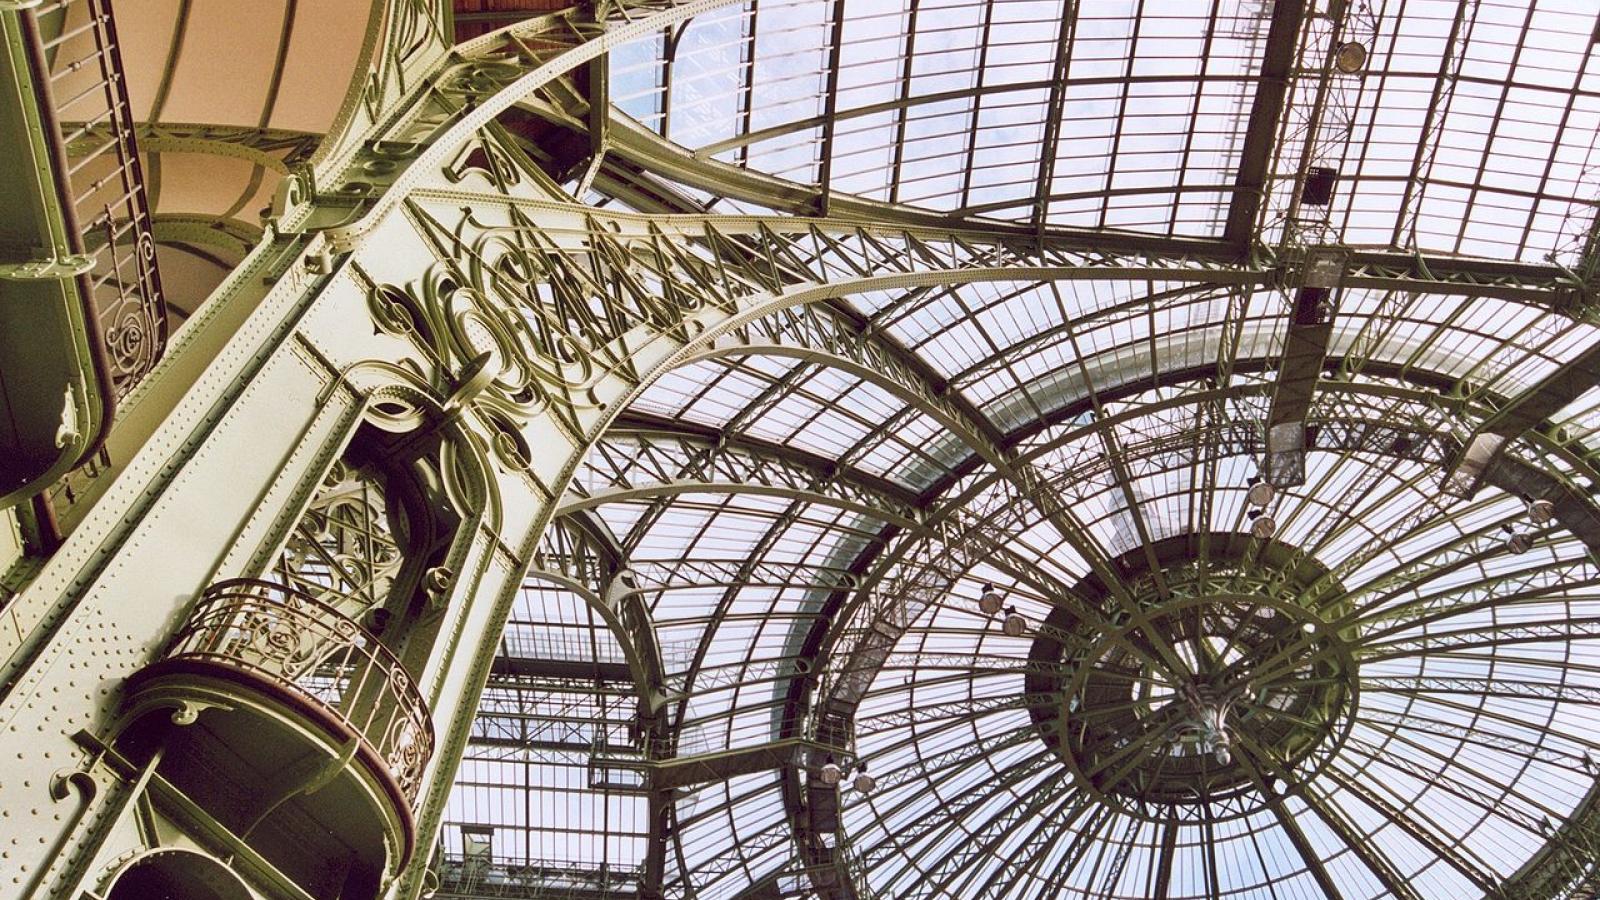 Paris has a rendezvous with contemporary art